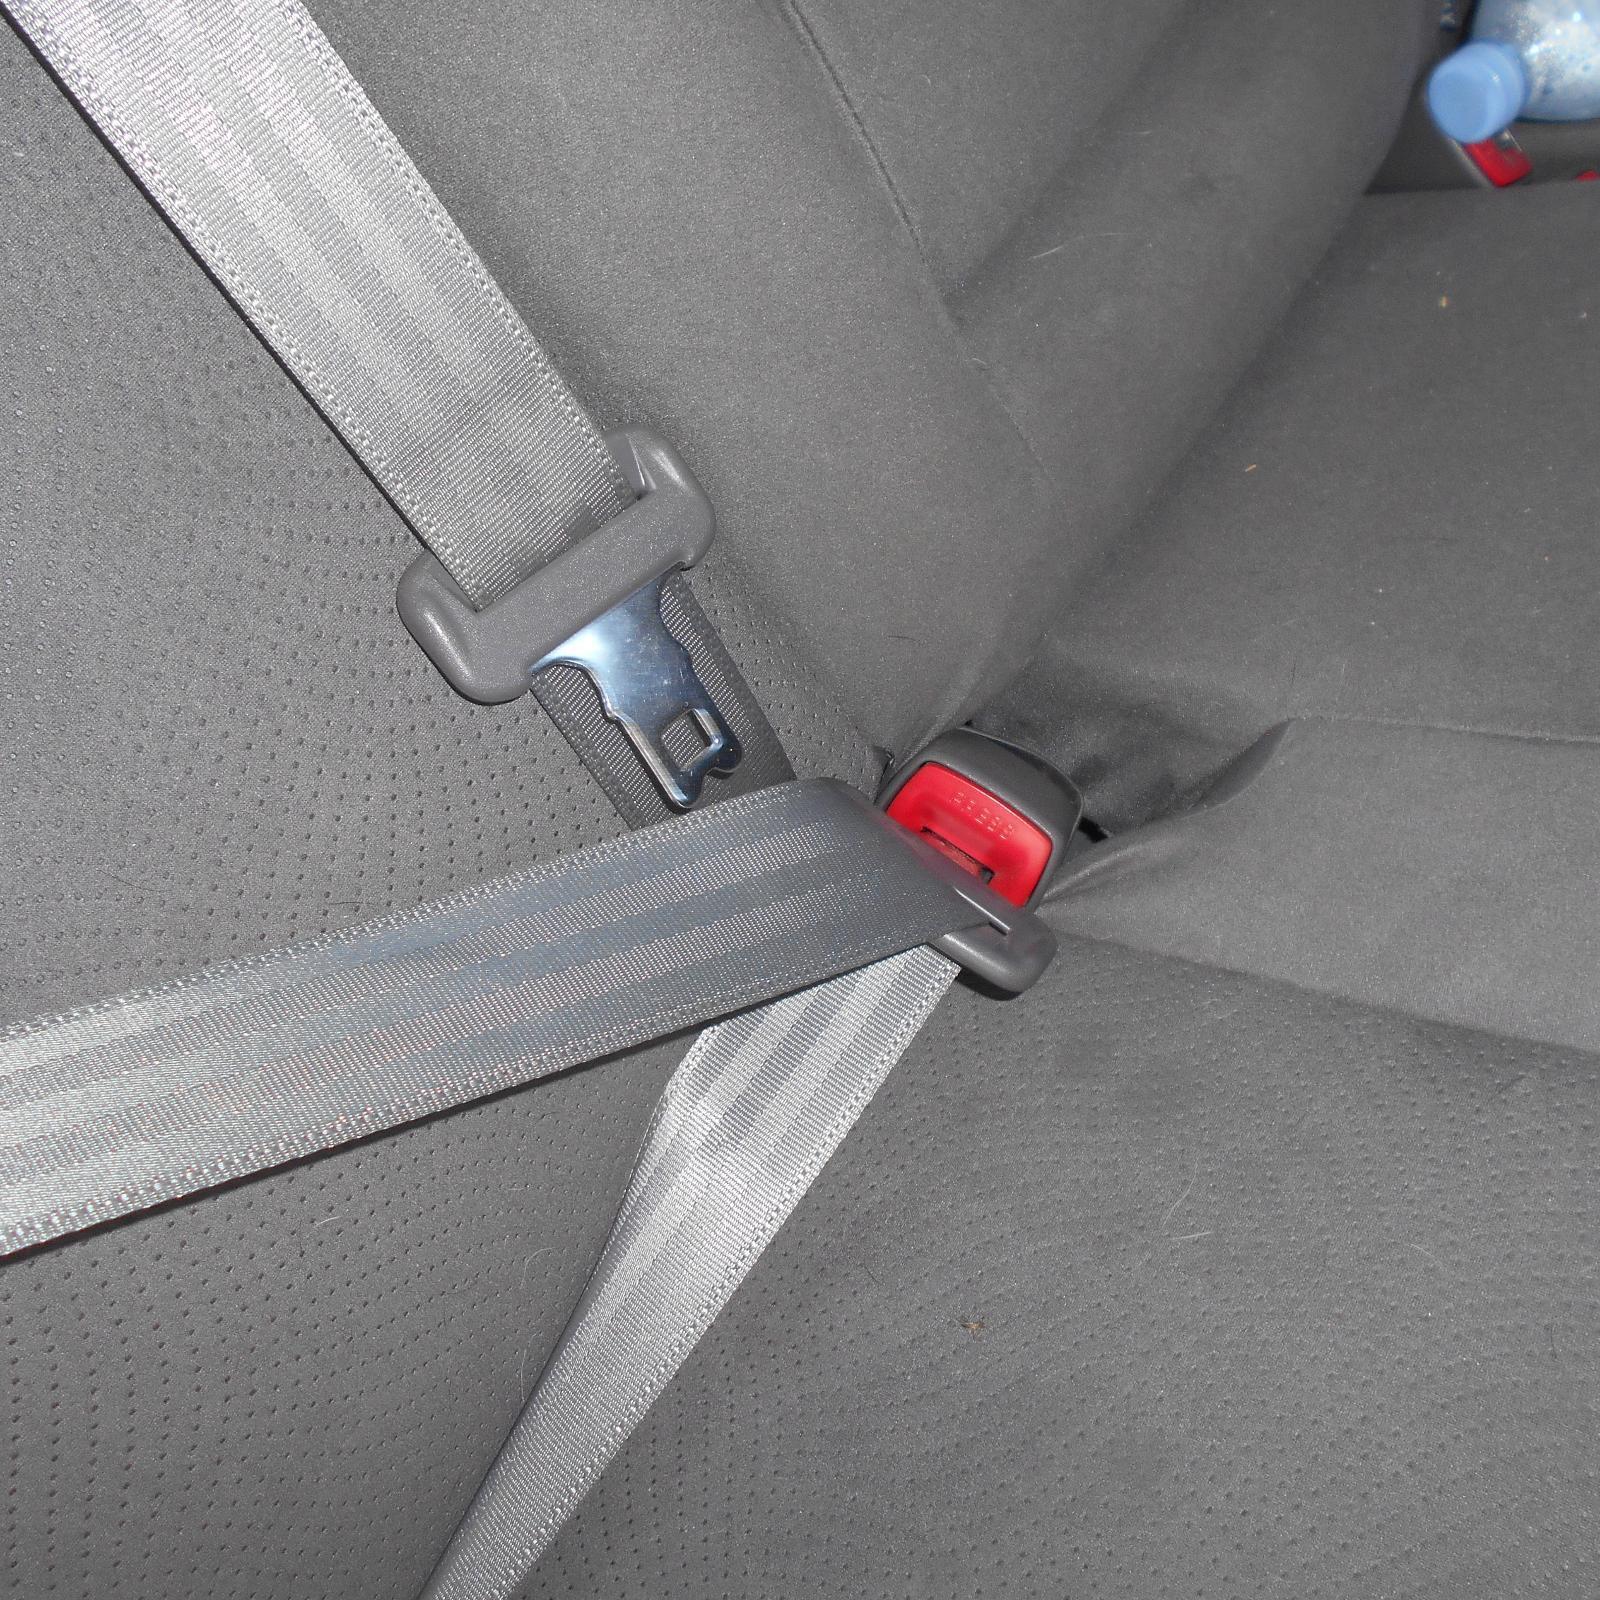 TOYOTA PRIUS, Seatbelt/Stalk, RH REAR, SEAT BELT ONLY, ZVW30R, 07/09-12/15